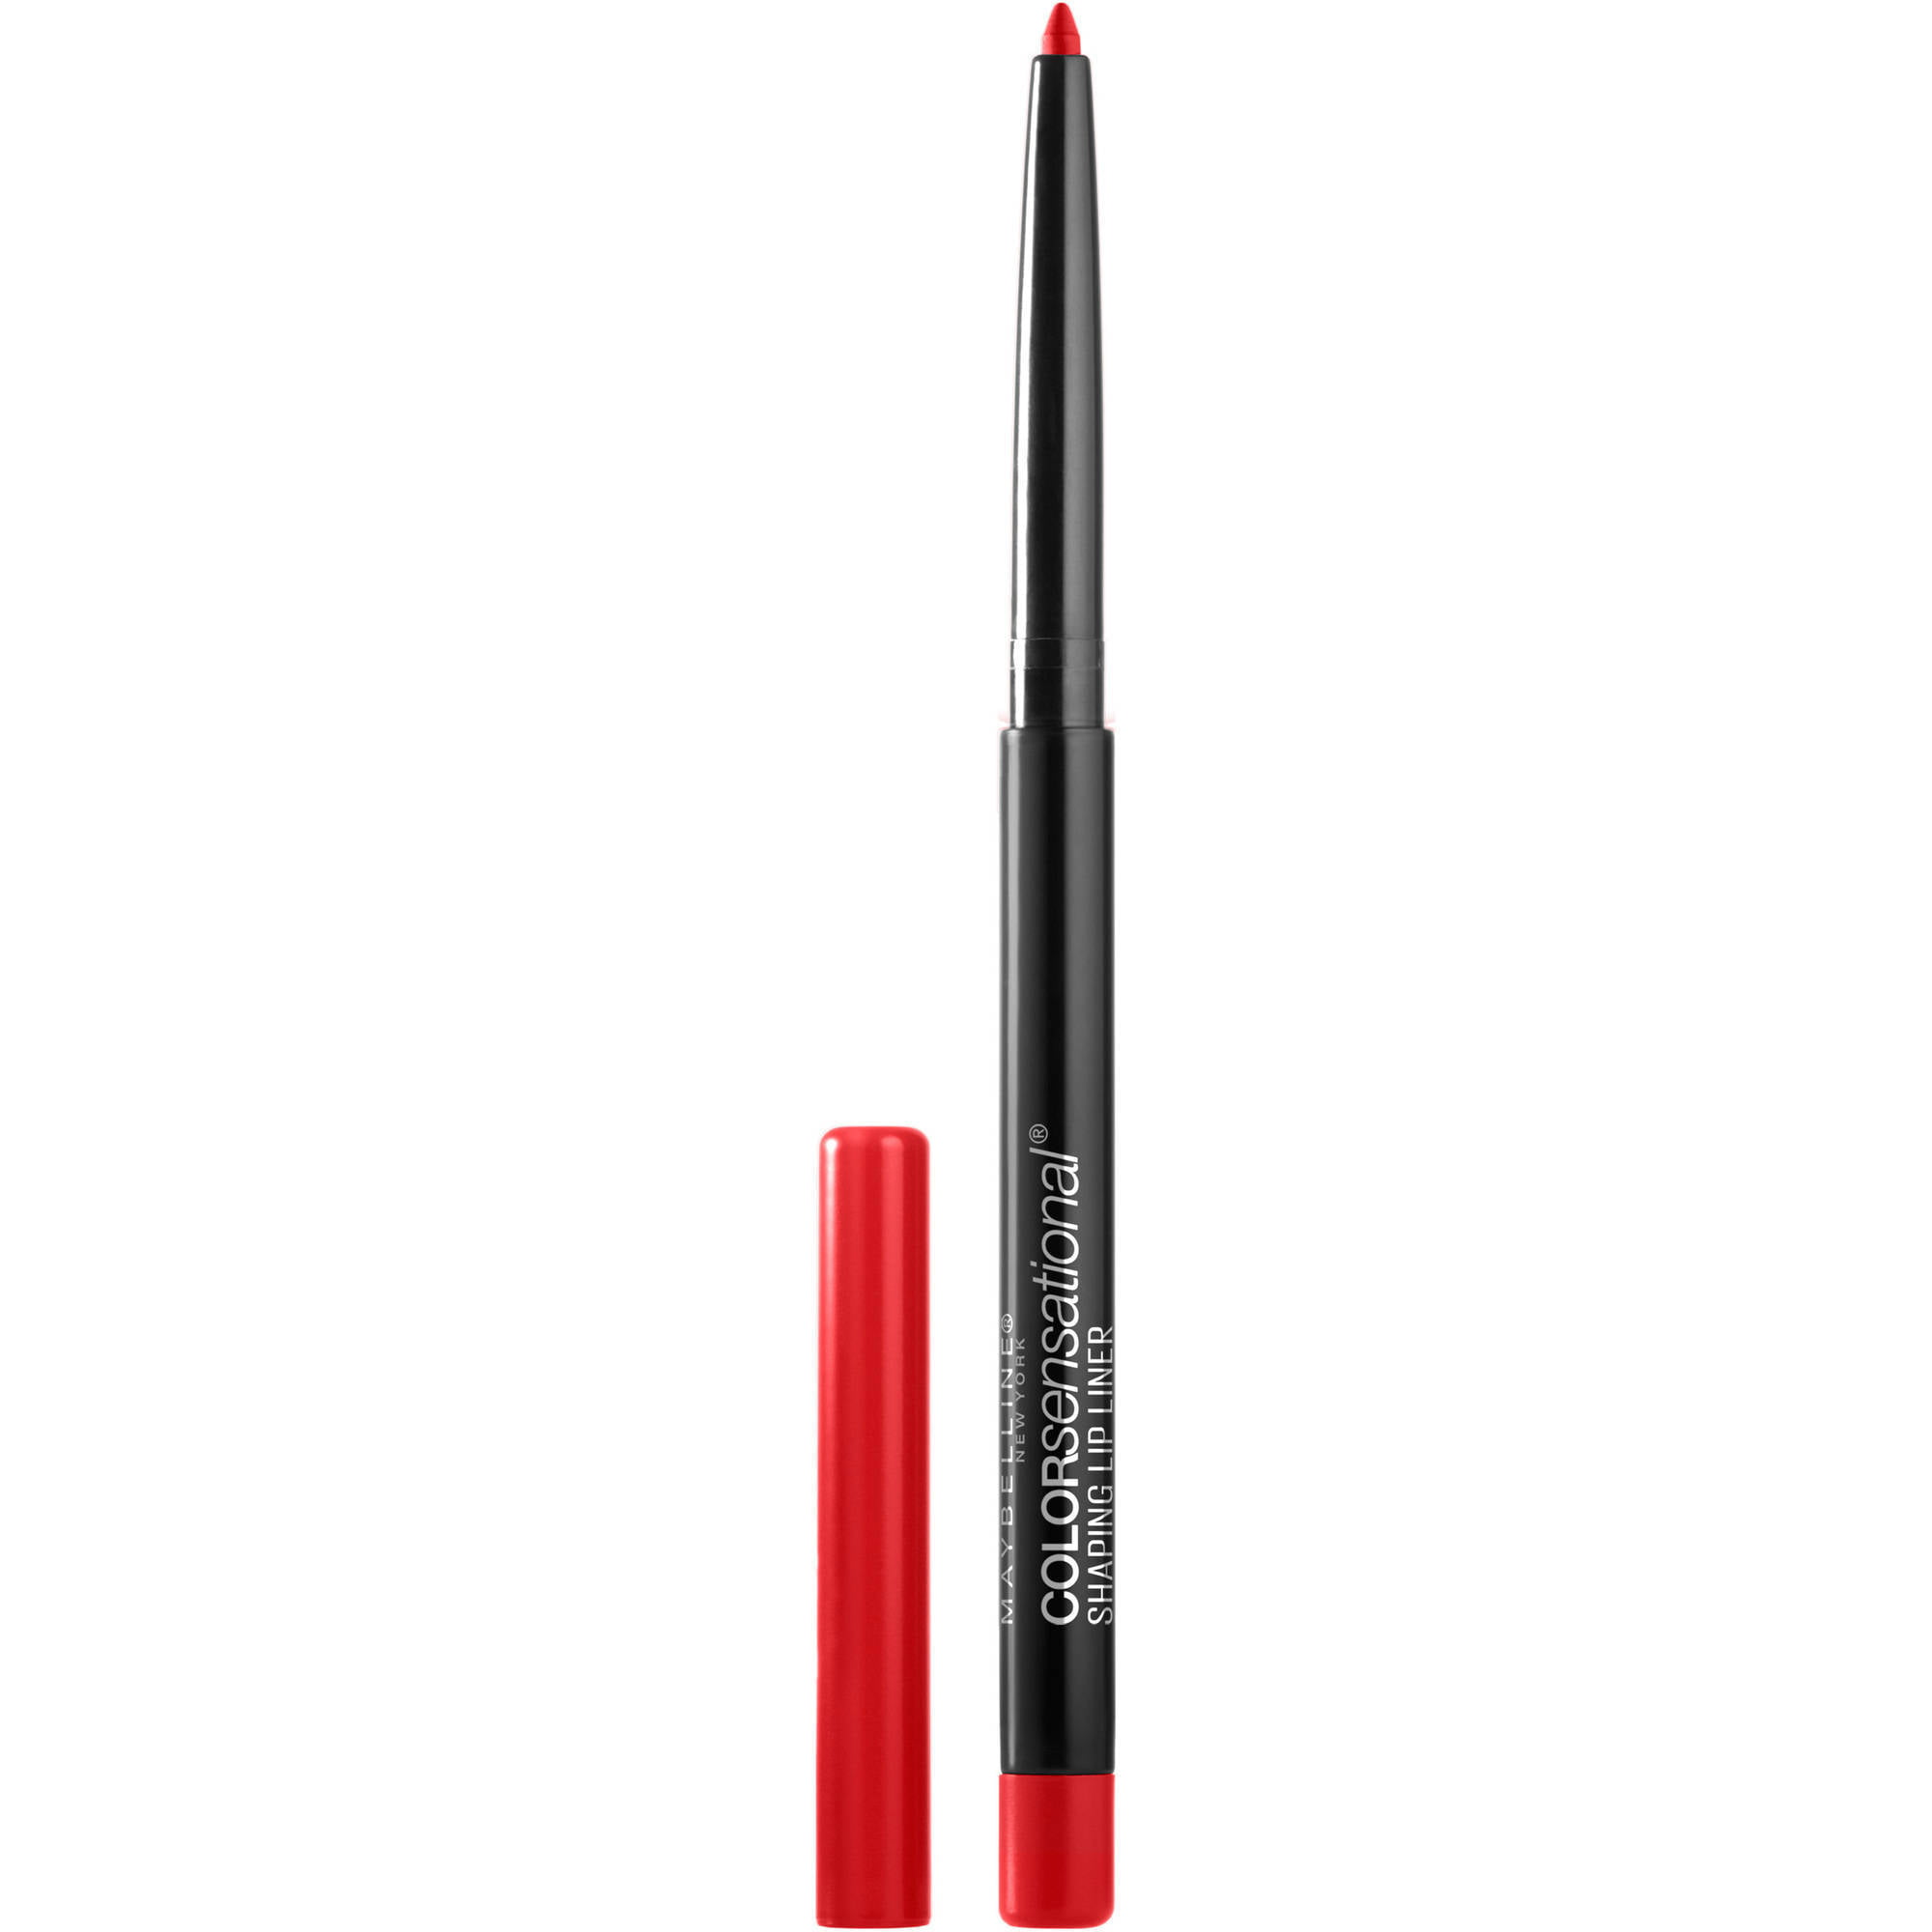 Lip Liner Pencil - Enhance lip shape   Palladio Beauty